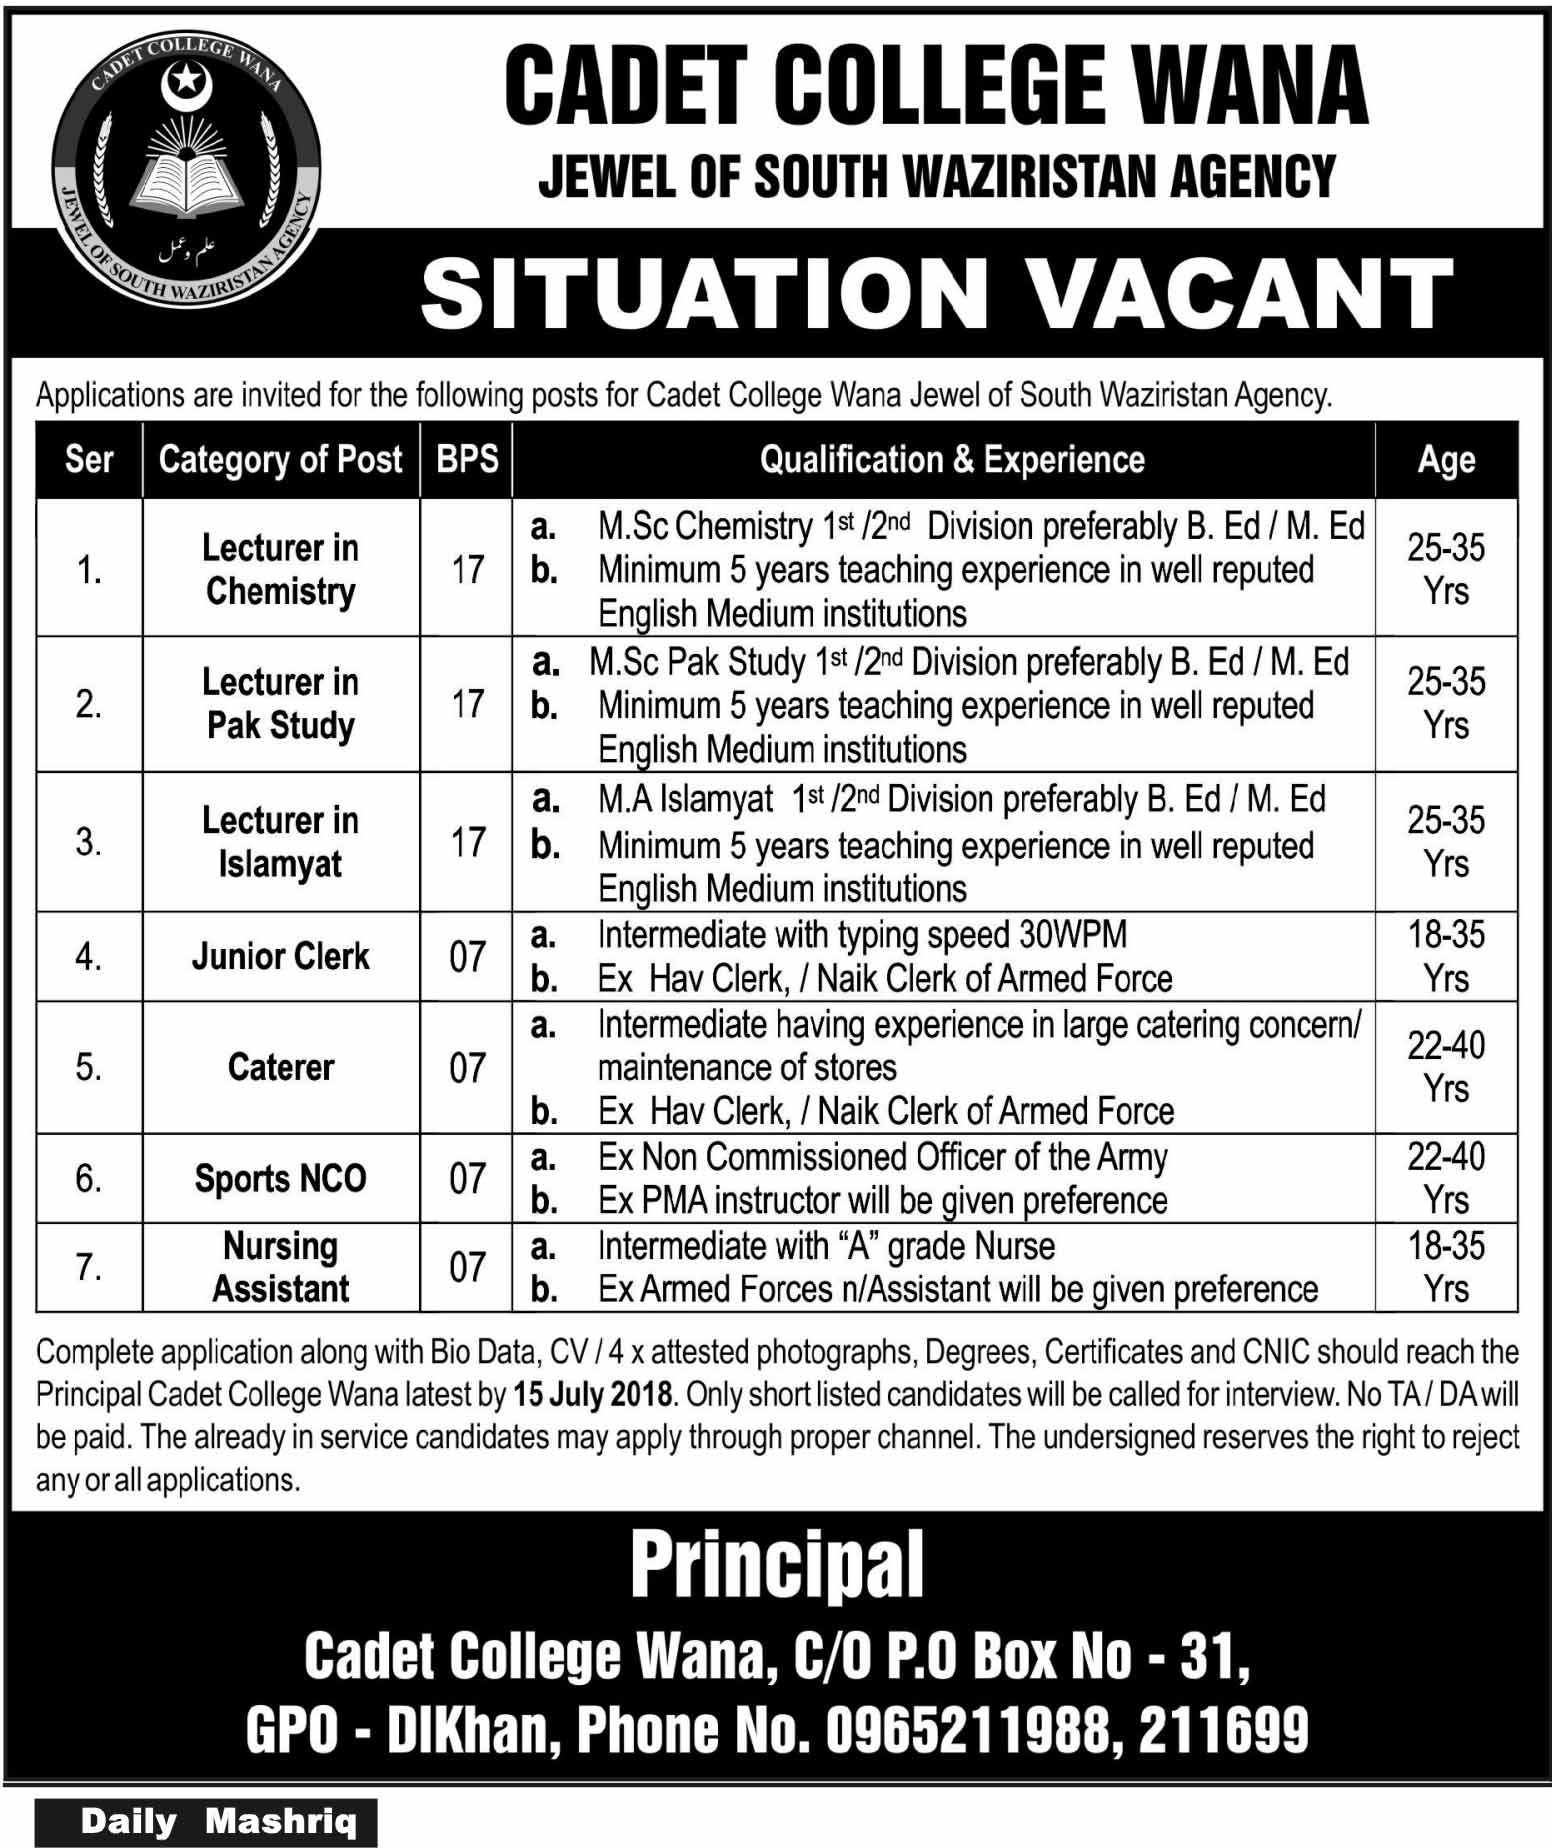 Cadet College Wana Jewel of South wazirstan Agency Latest Jobs 2018 Pakistan-thumbnail